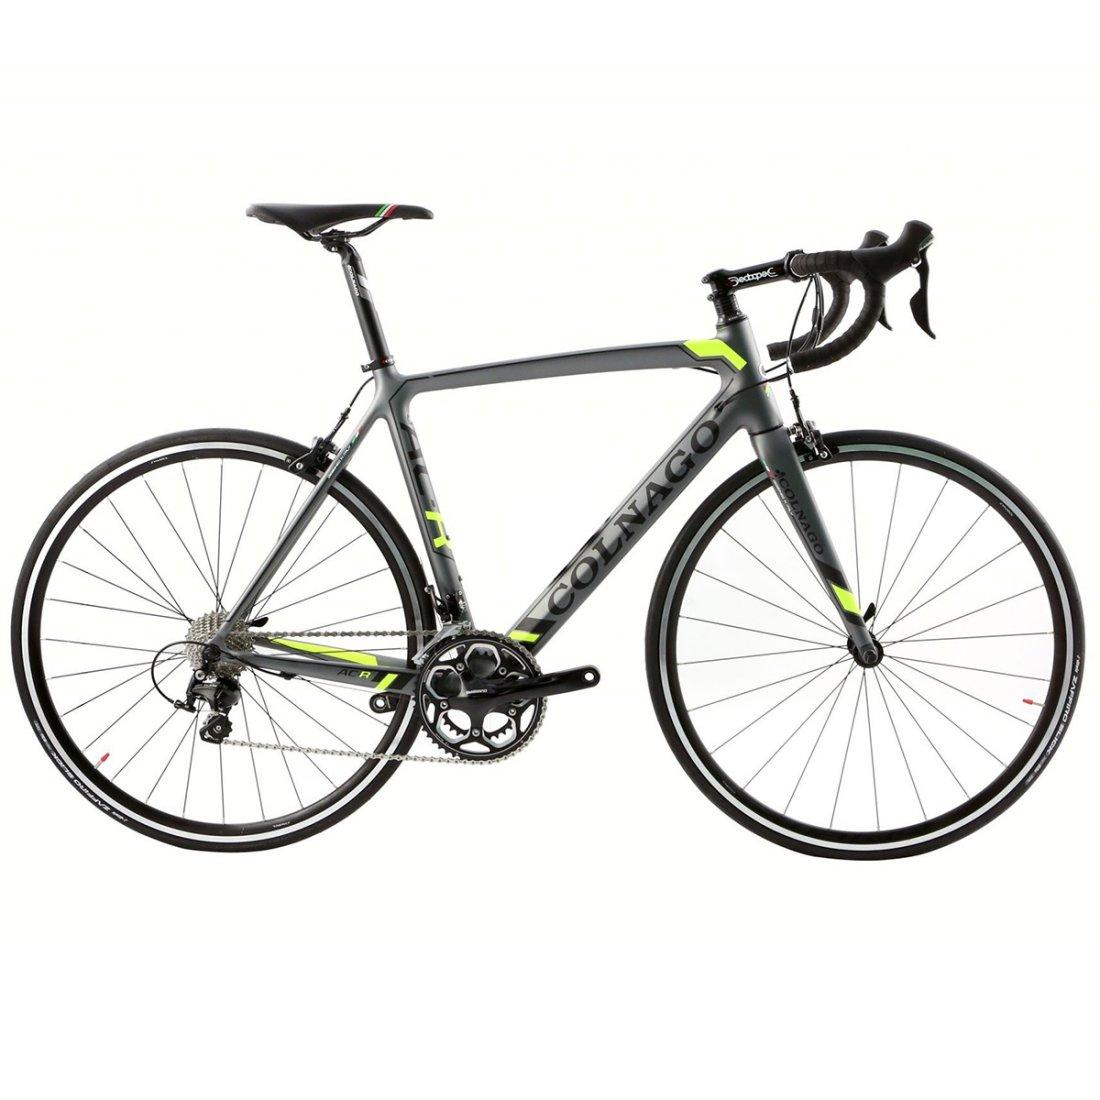 COLNAGO AC-R Shimano 105 2015 Grey / Yellow Road bike · Motocard